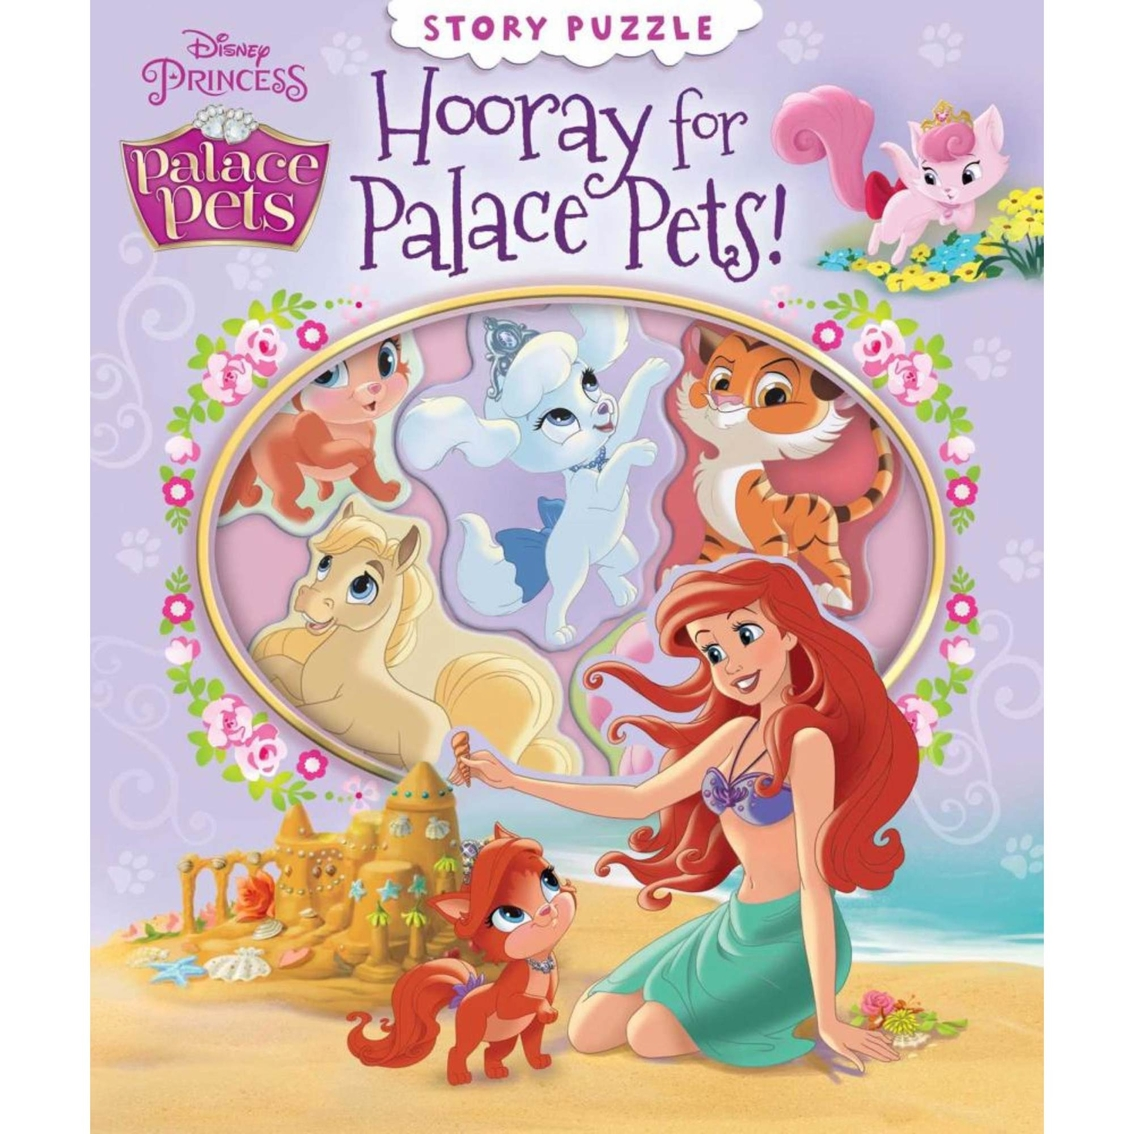 PALACE PETS Animals PRINCESSES Disney UMBRELLA Girl ORIGINAL New Offer